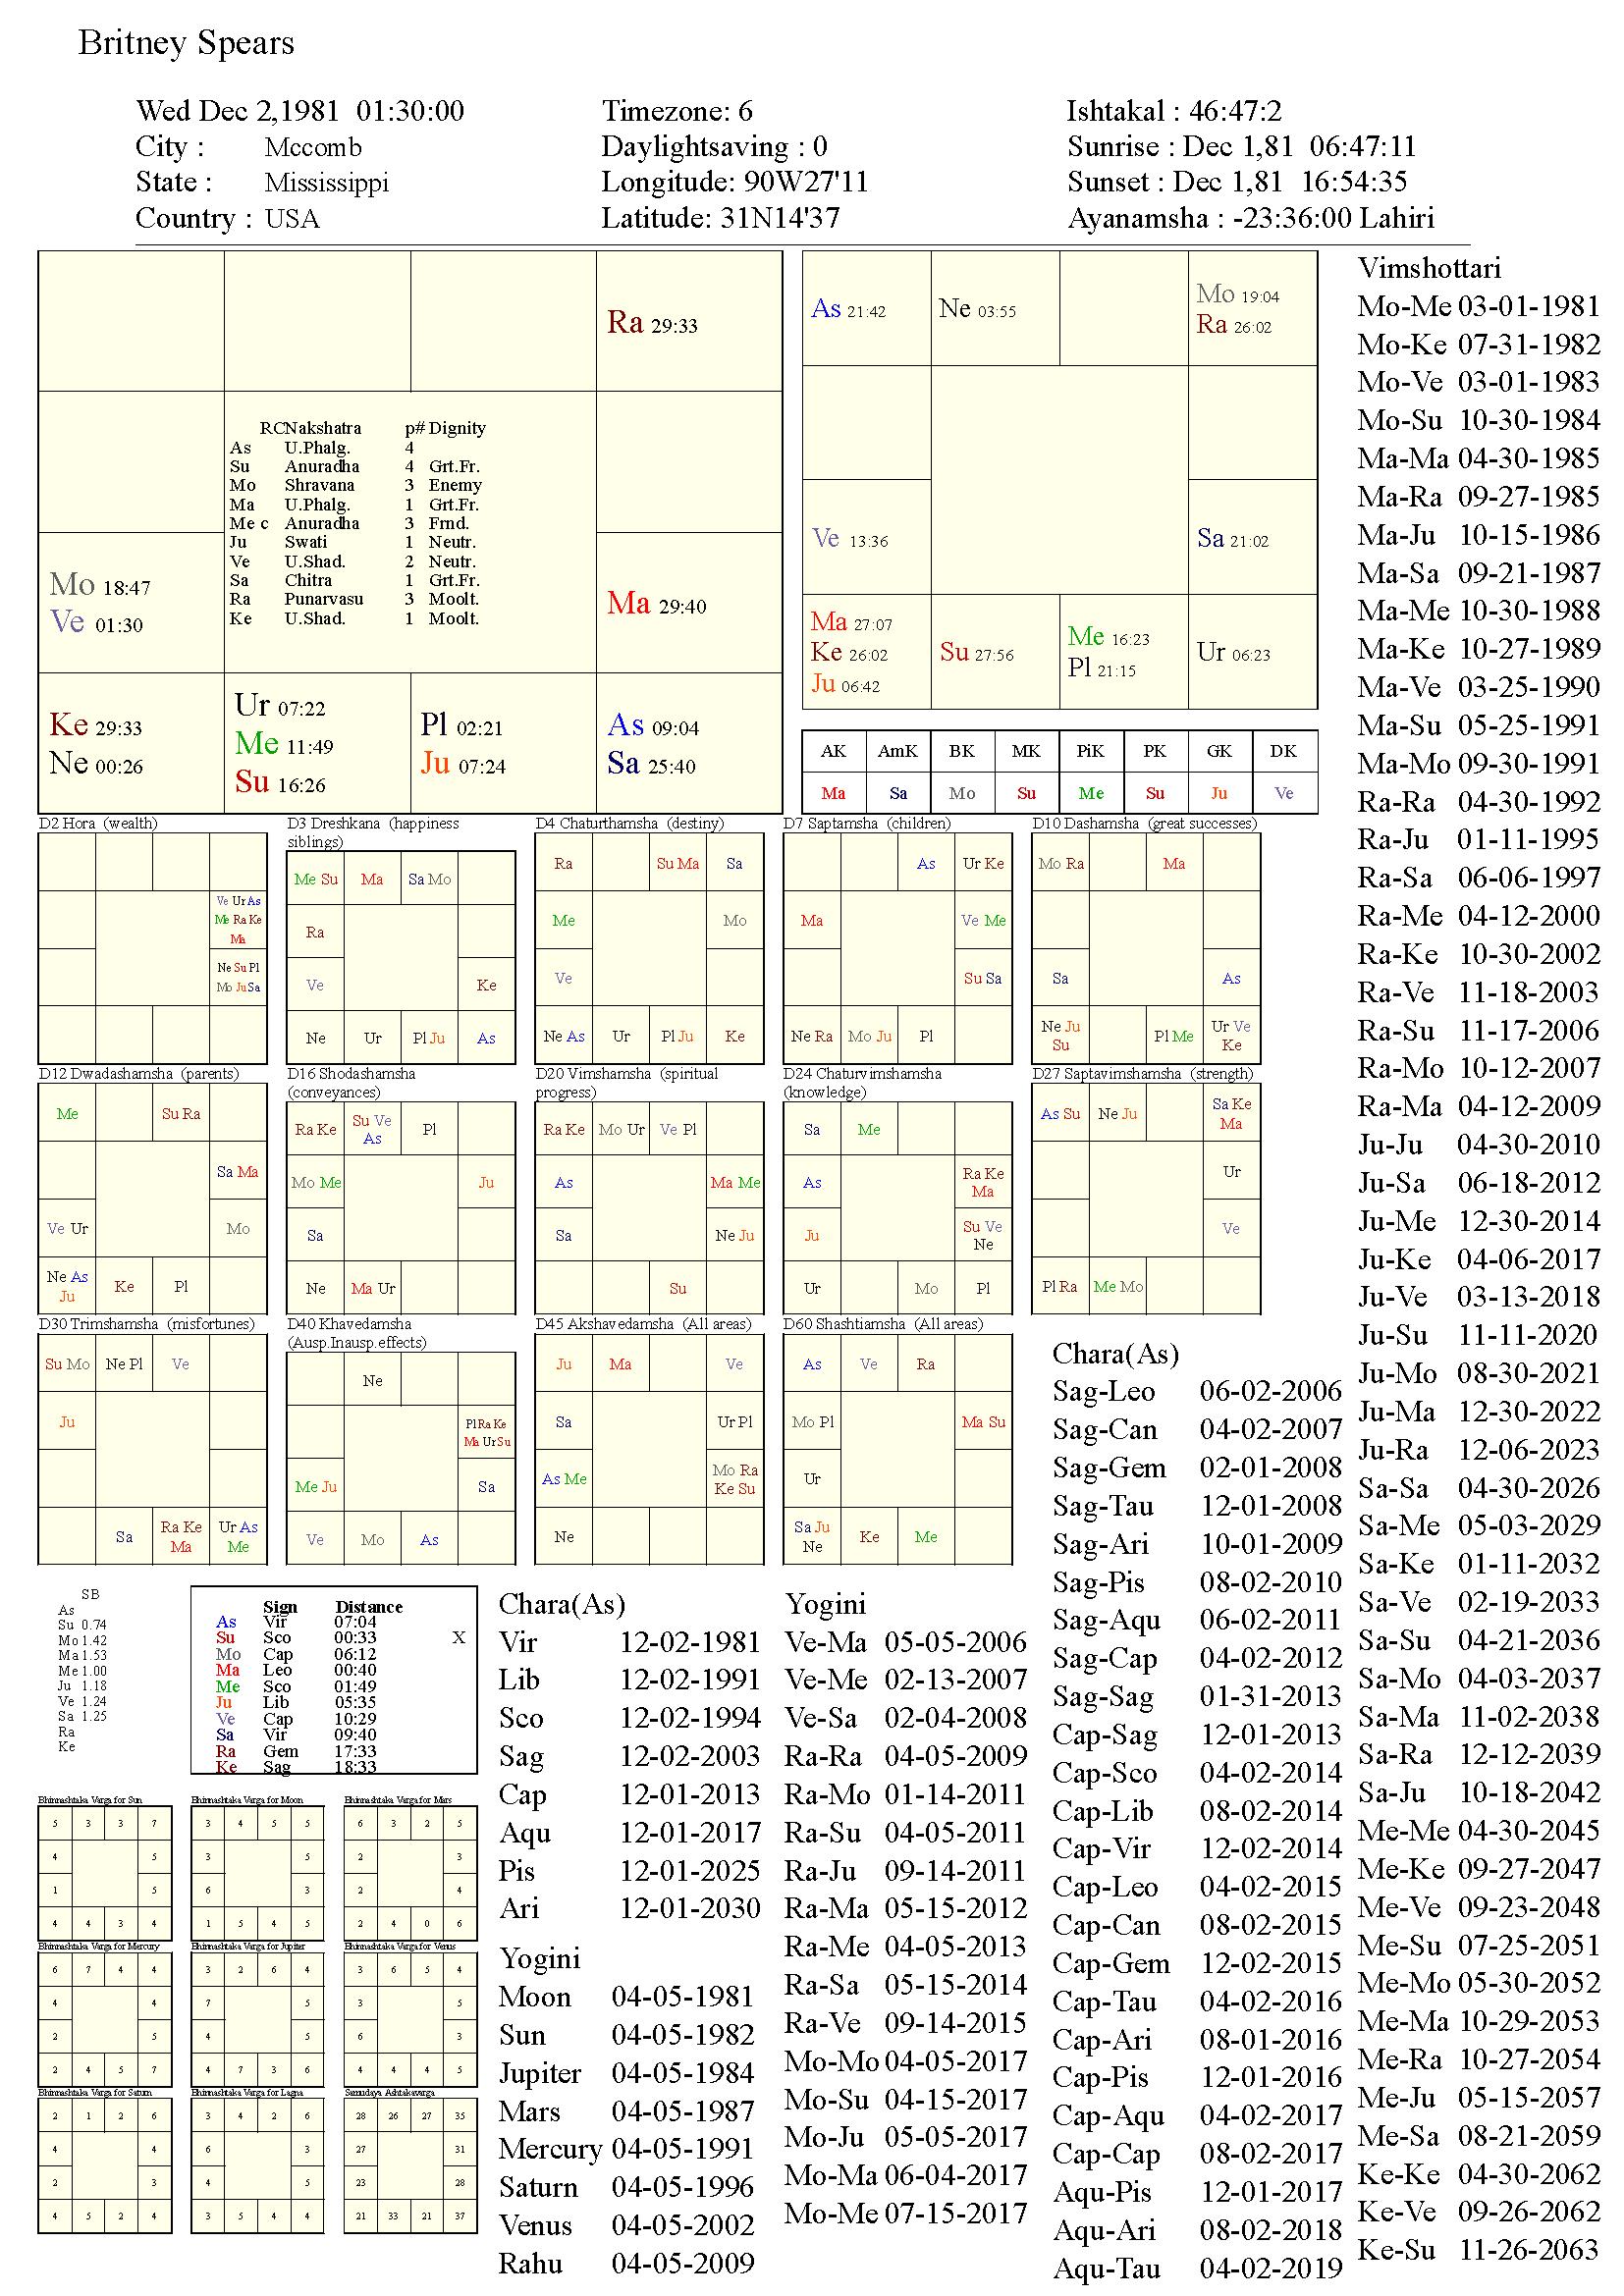 britneyspears_chart